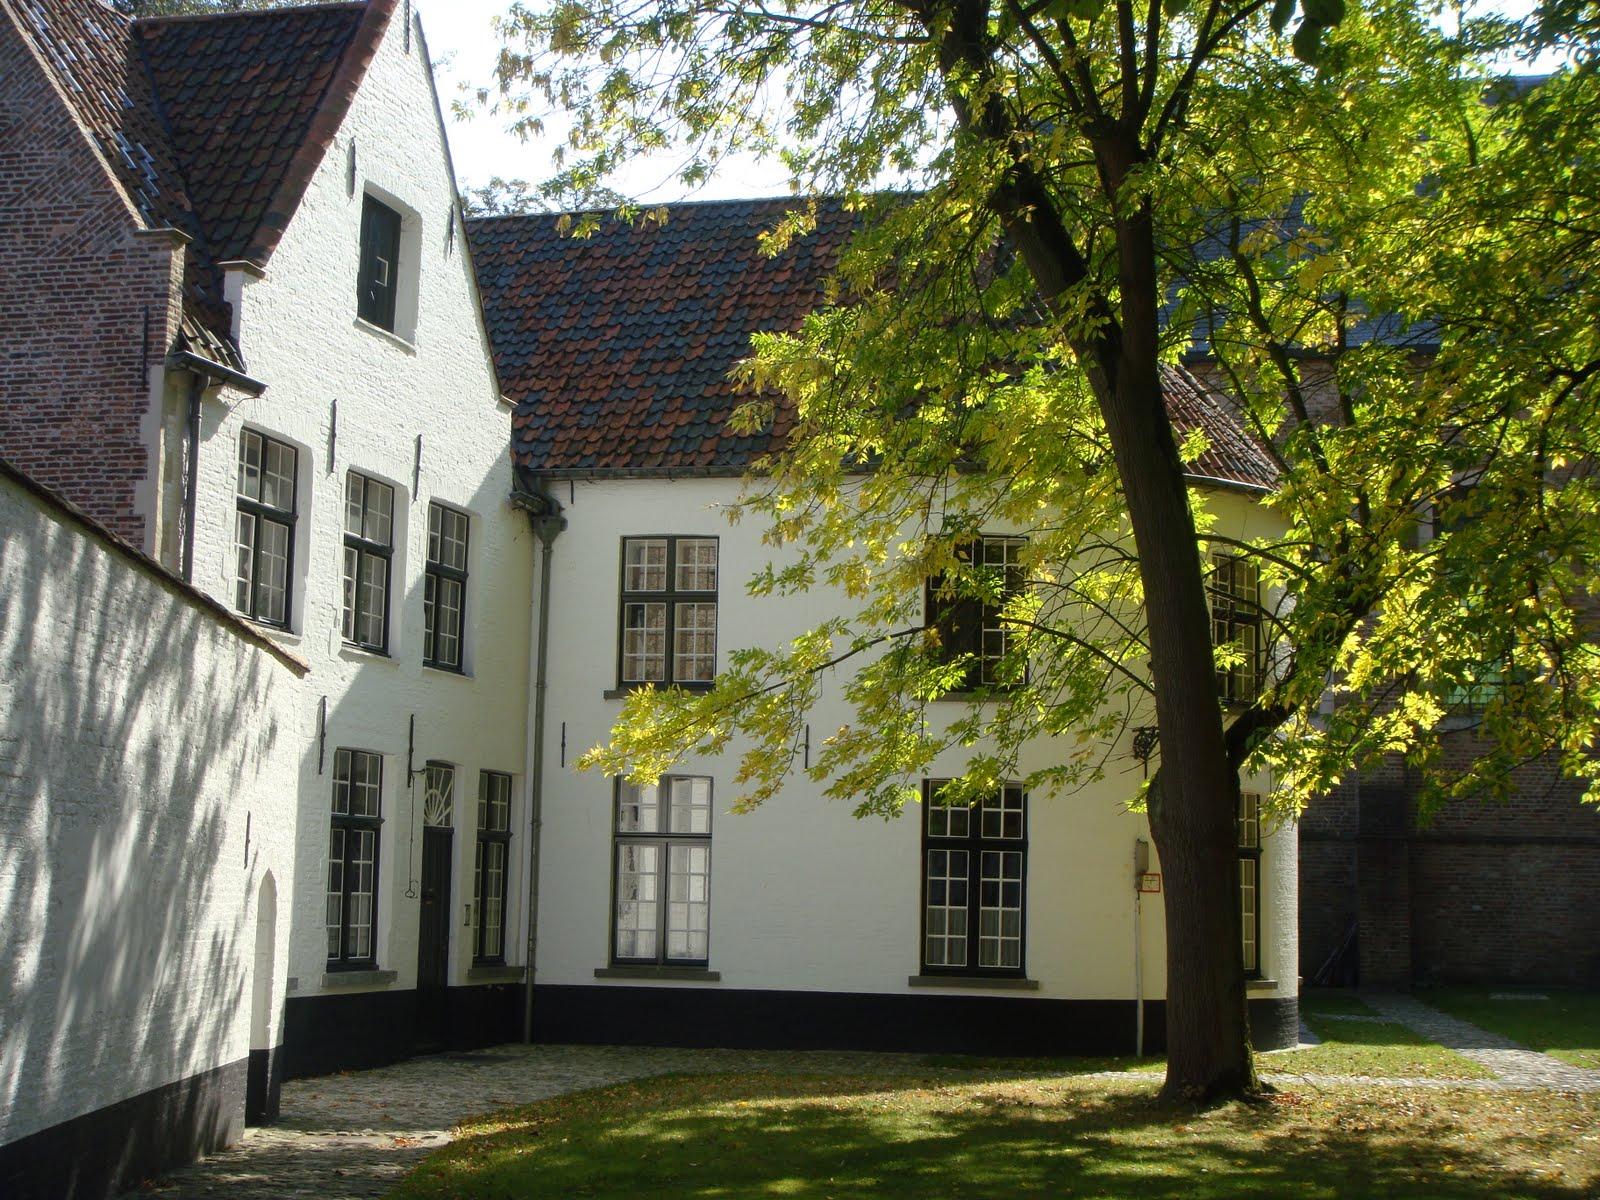 Beguinaje, Convento Medieval, Brujas, Elisa N, Blog de Viajes, Lifestyle, Travel